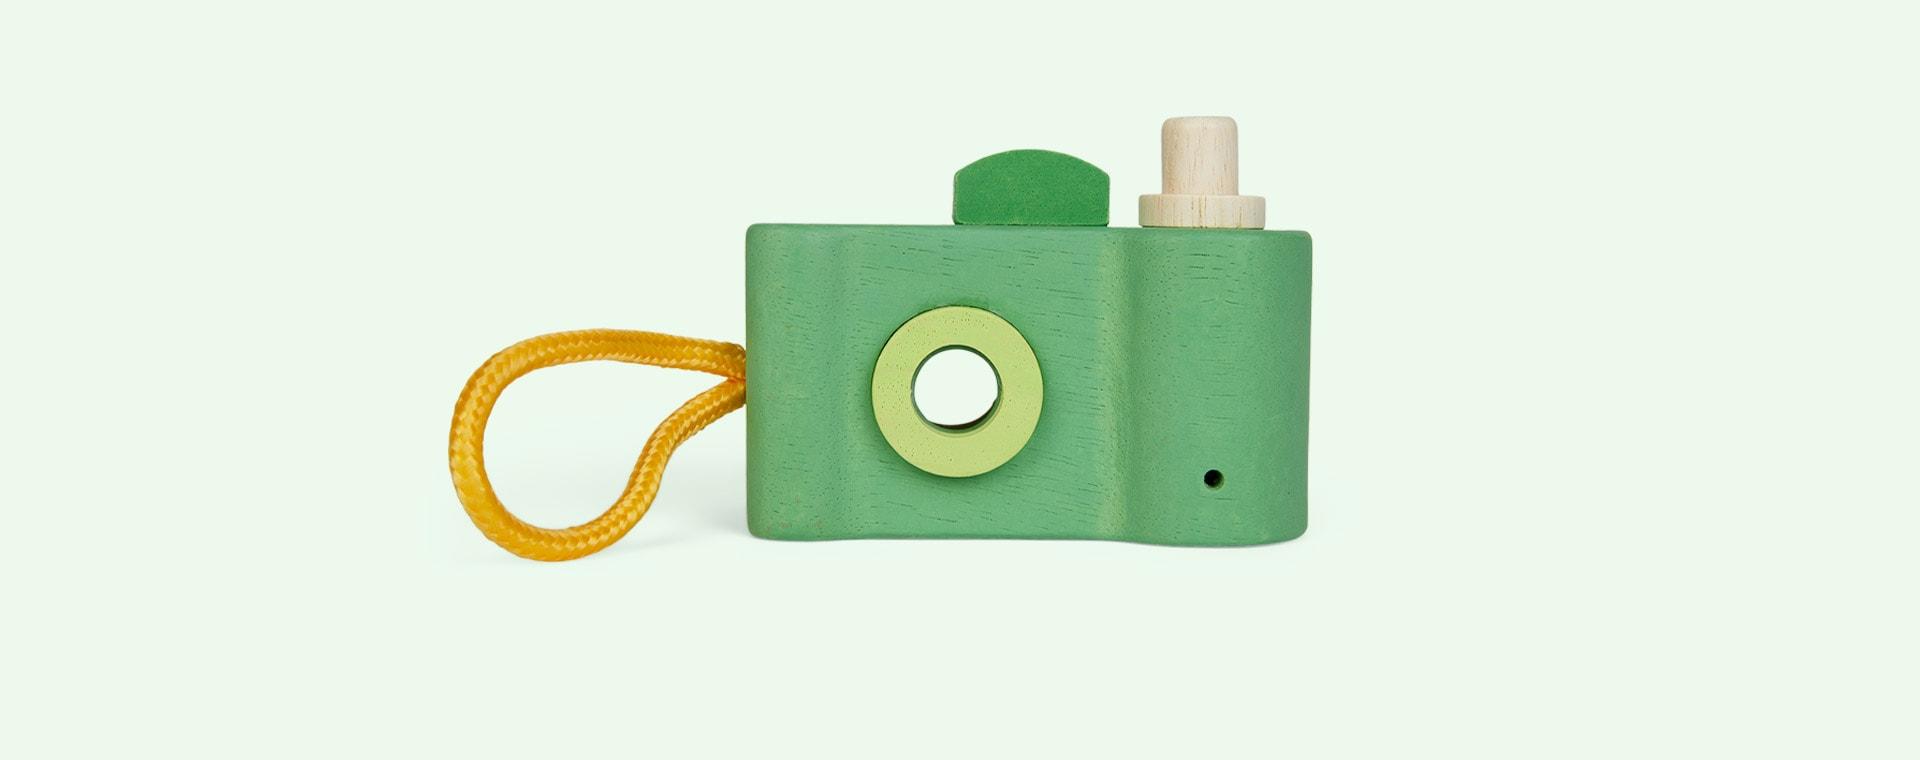 Green Legler Toys Wooden Toy Camera